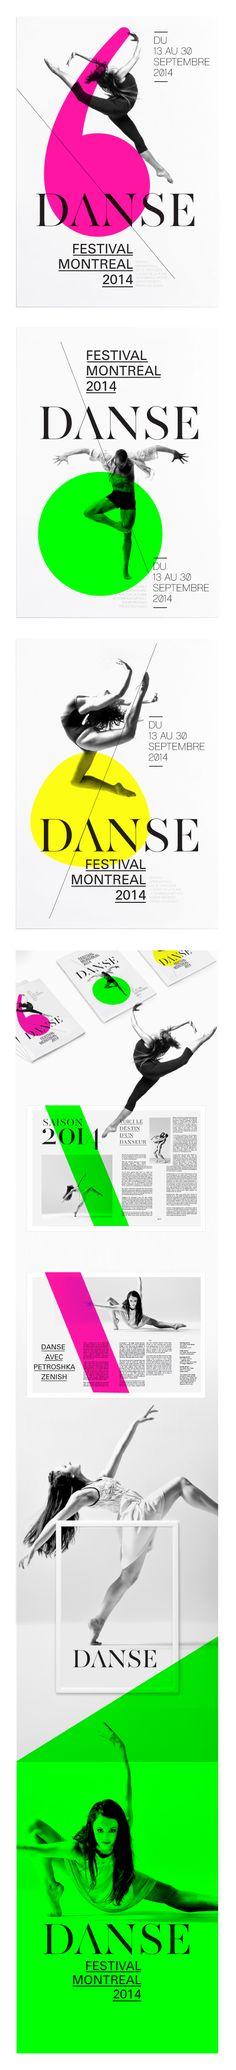 s/w bilder und Farbflächen - FESTIVAL DE DANSE DE MONTREAL by THEBAULT JULIEN, via Behance